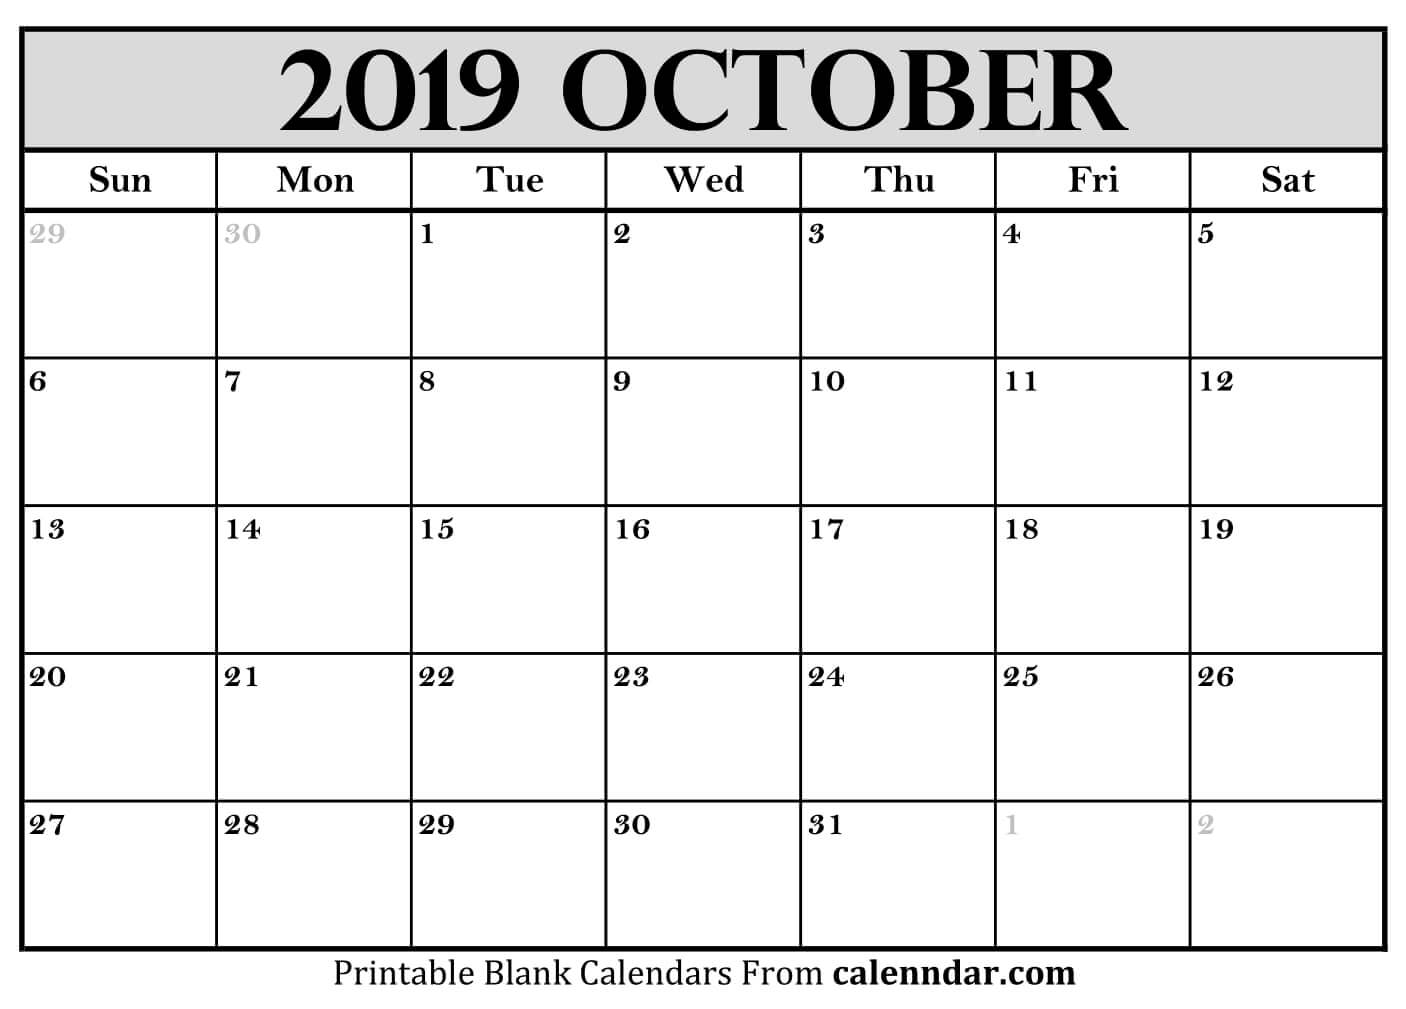 Template of October 2019 Calendar